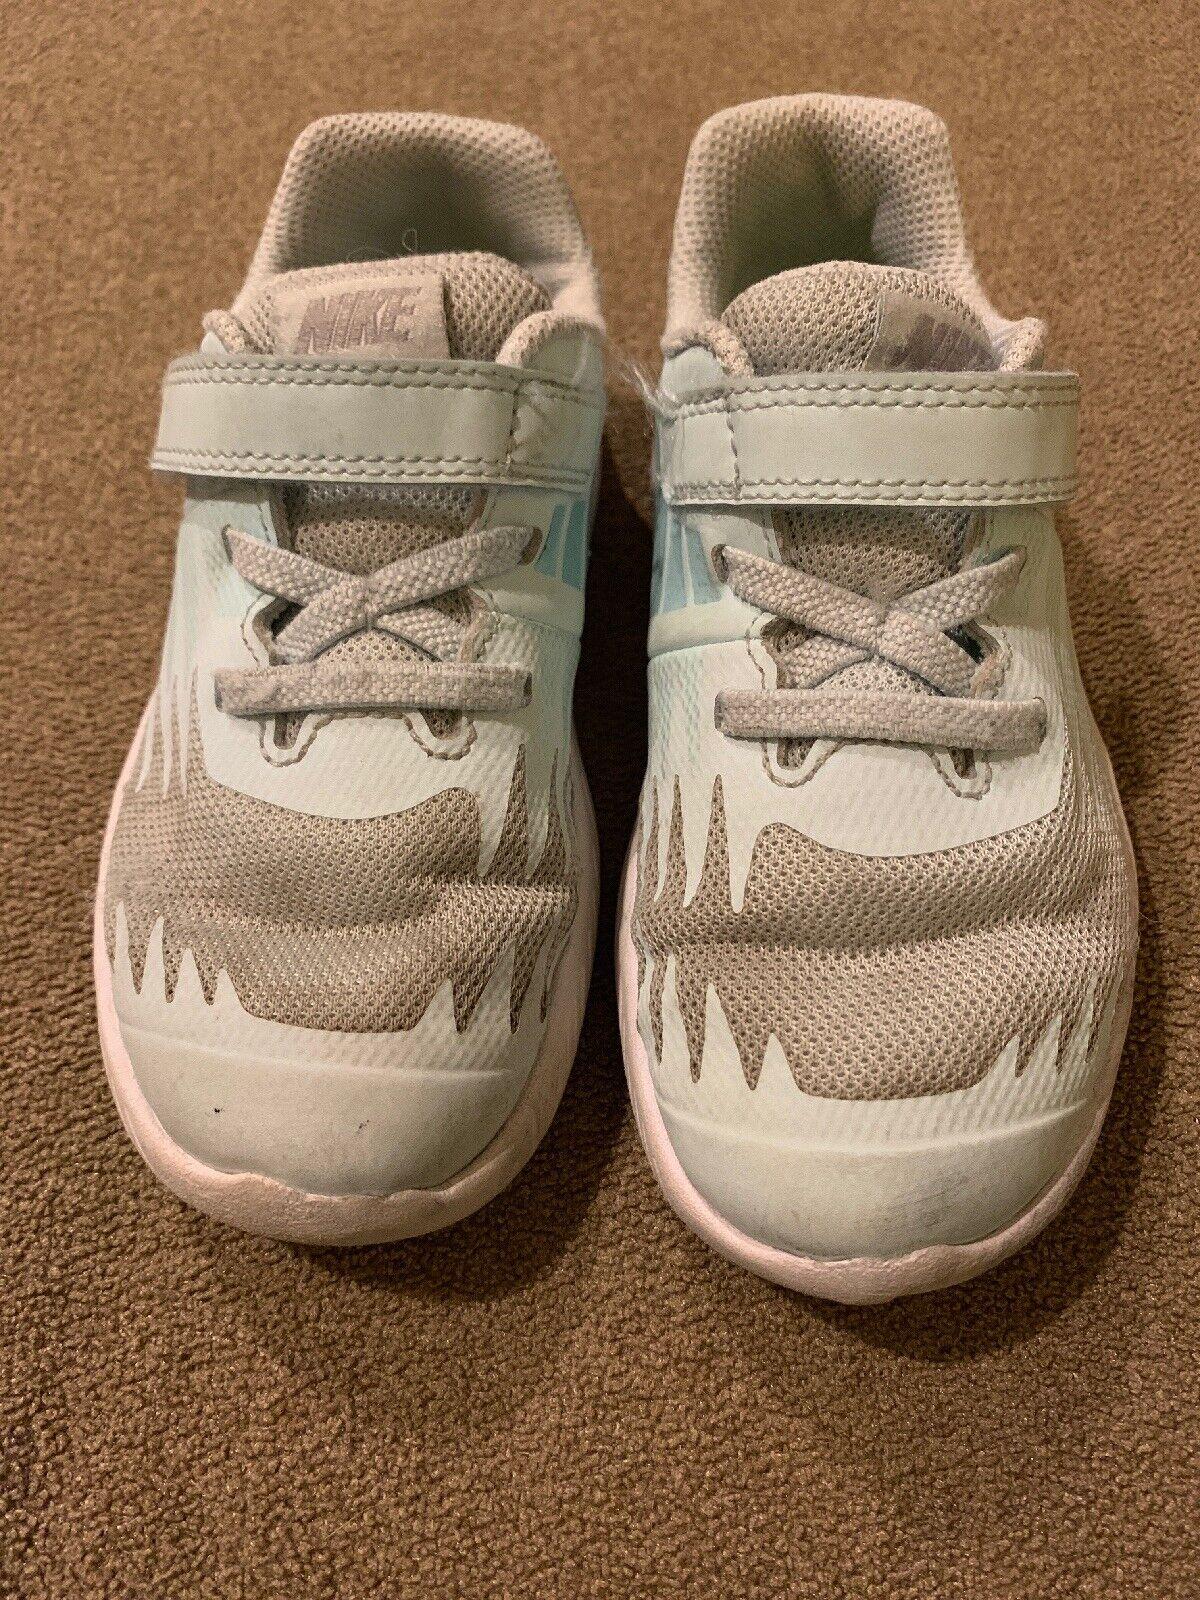 Nike Girl Shoes 5c Glacier Blue Gray